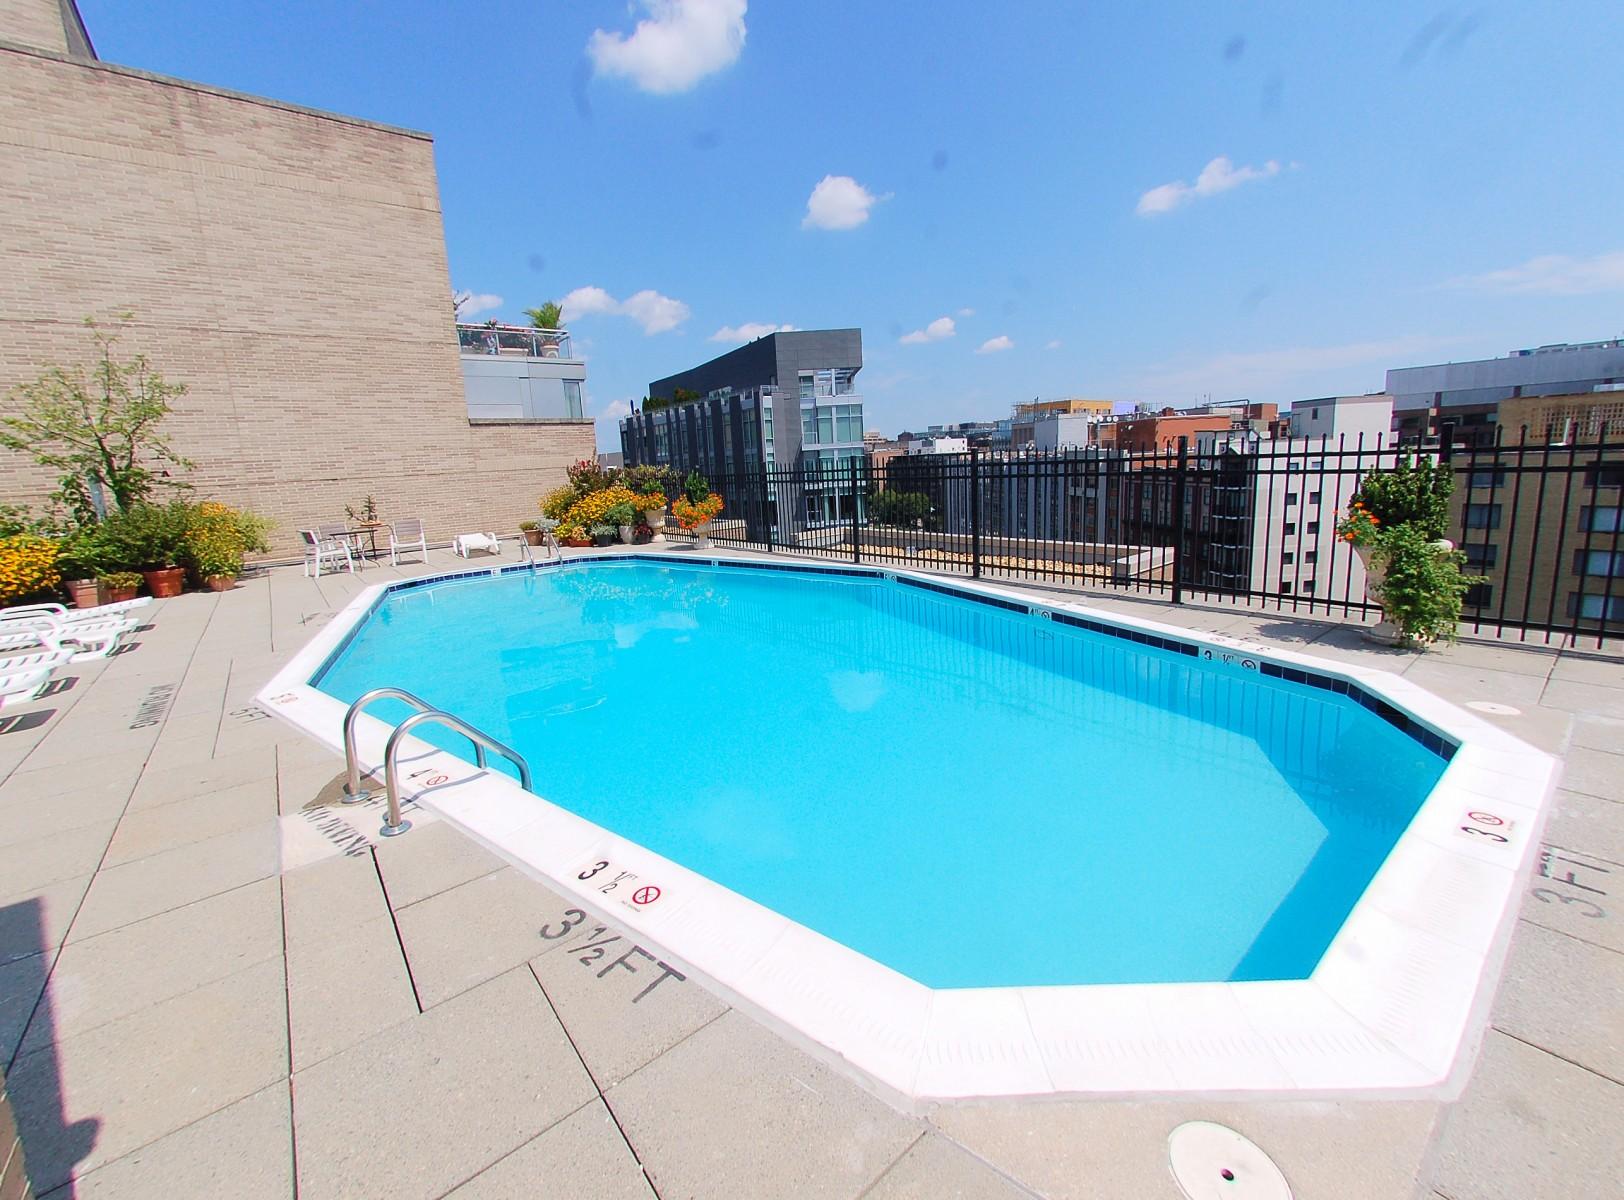 2201LStNW411-pool